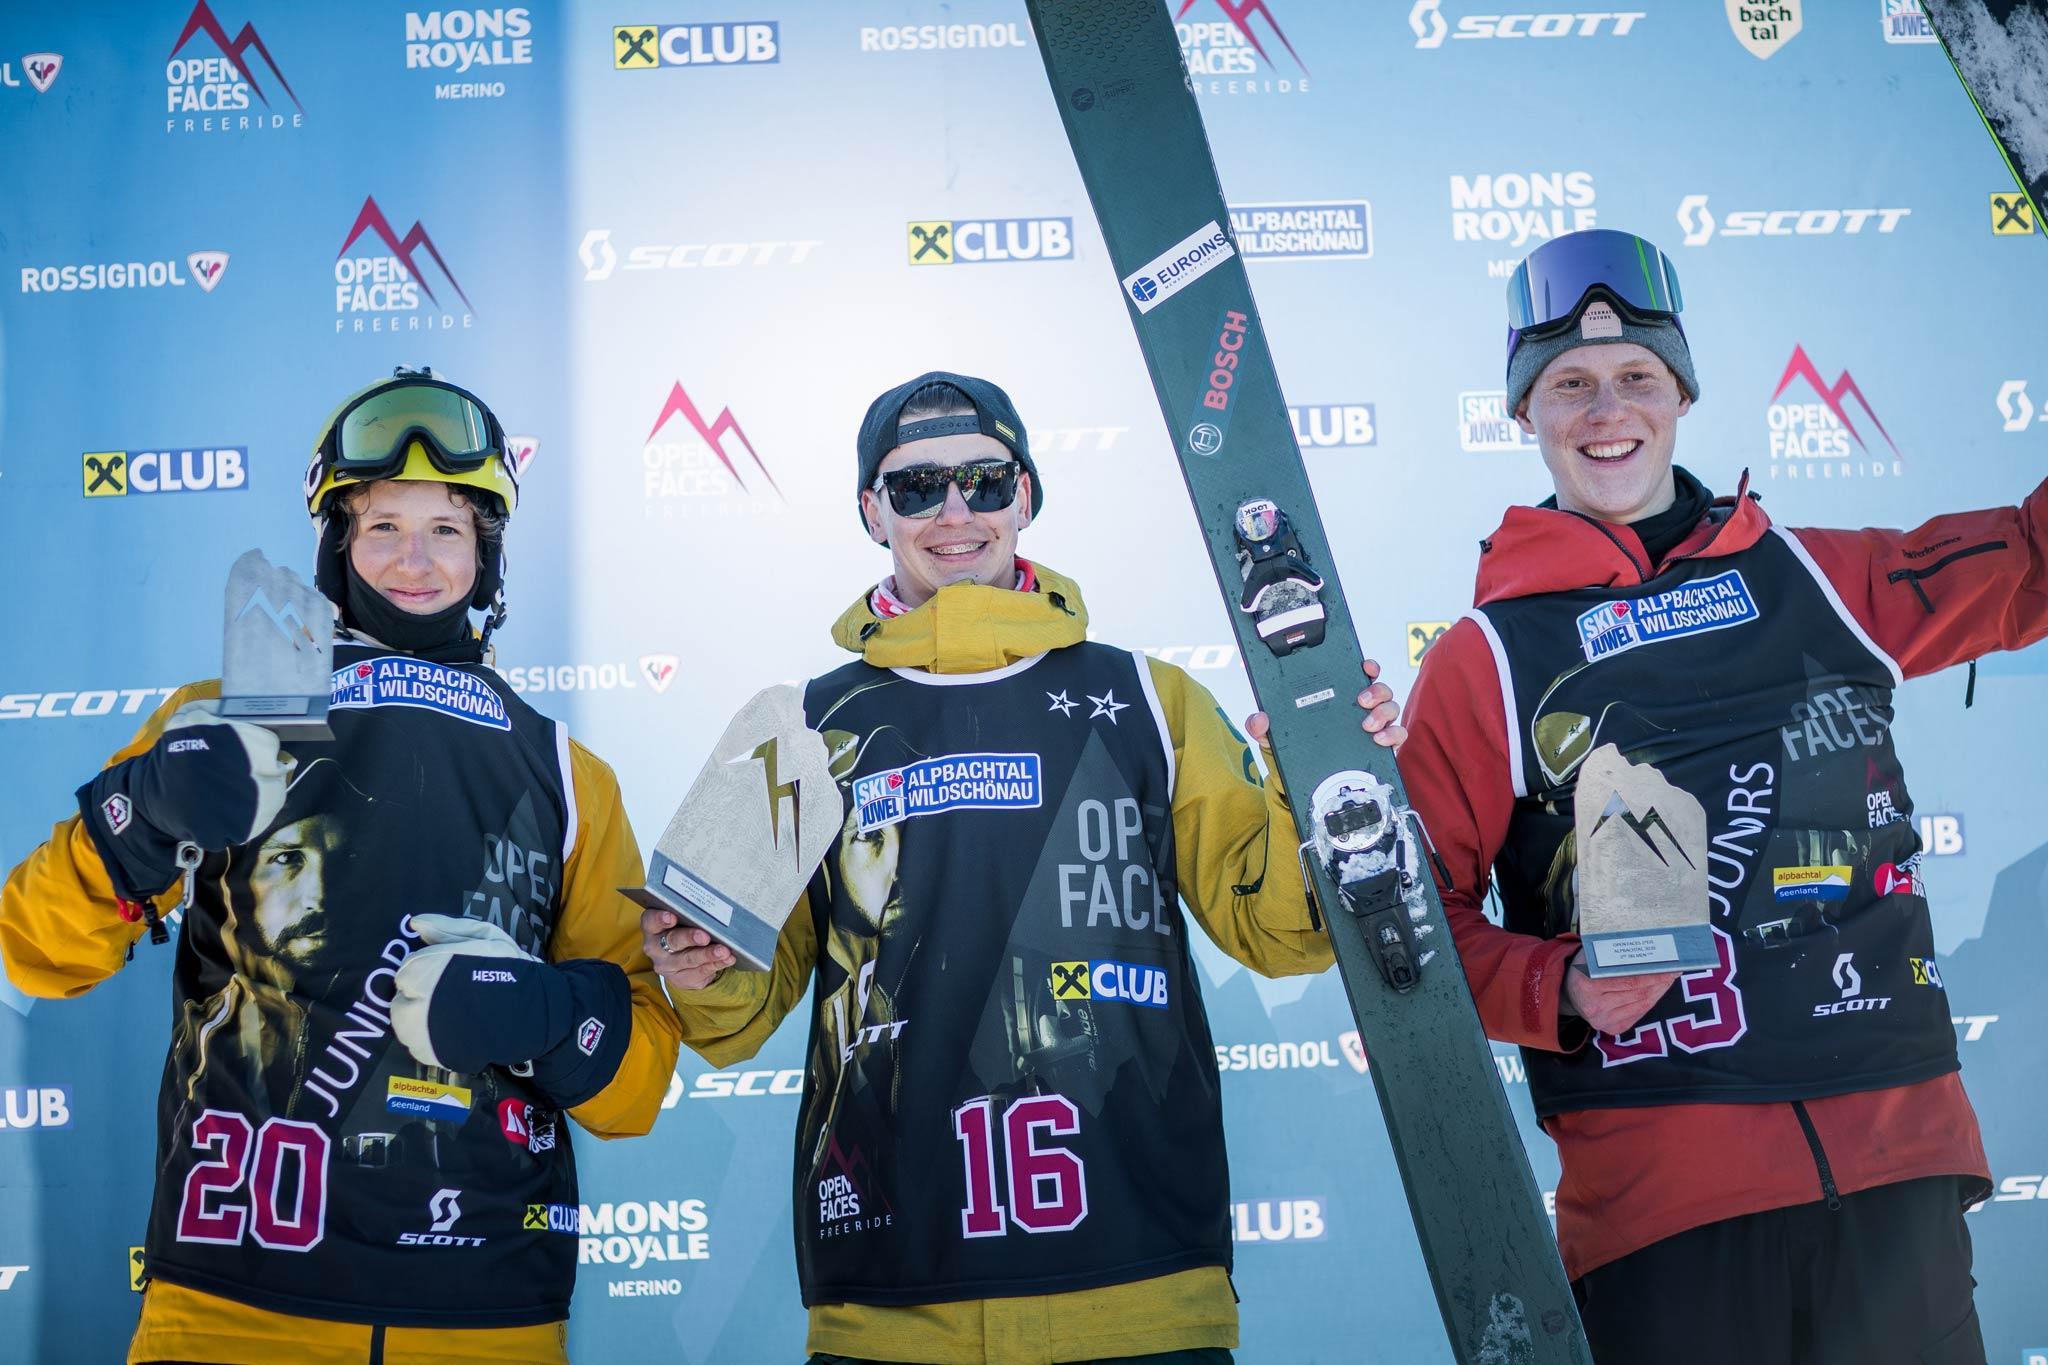 Die drei besten in der Kategorie U18 Ski Herren: Maximilian Steiner (AUT), Borislav Garibox (BGR), Georg Vachuda (AUT) - Foto: Mia Knoll